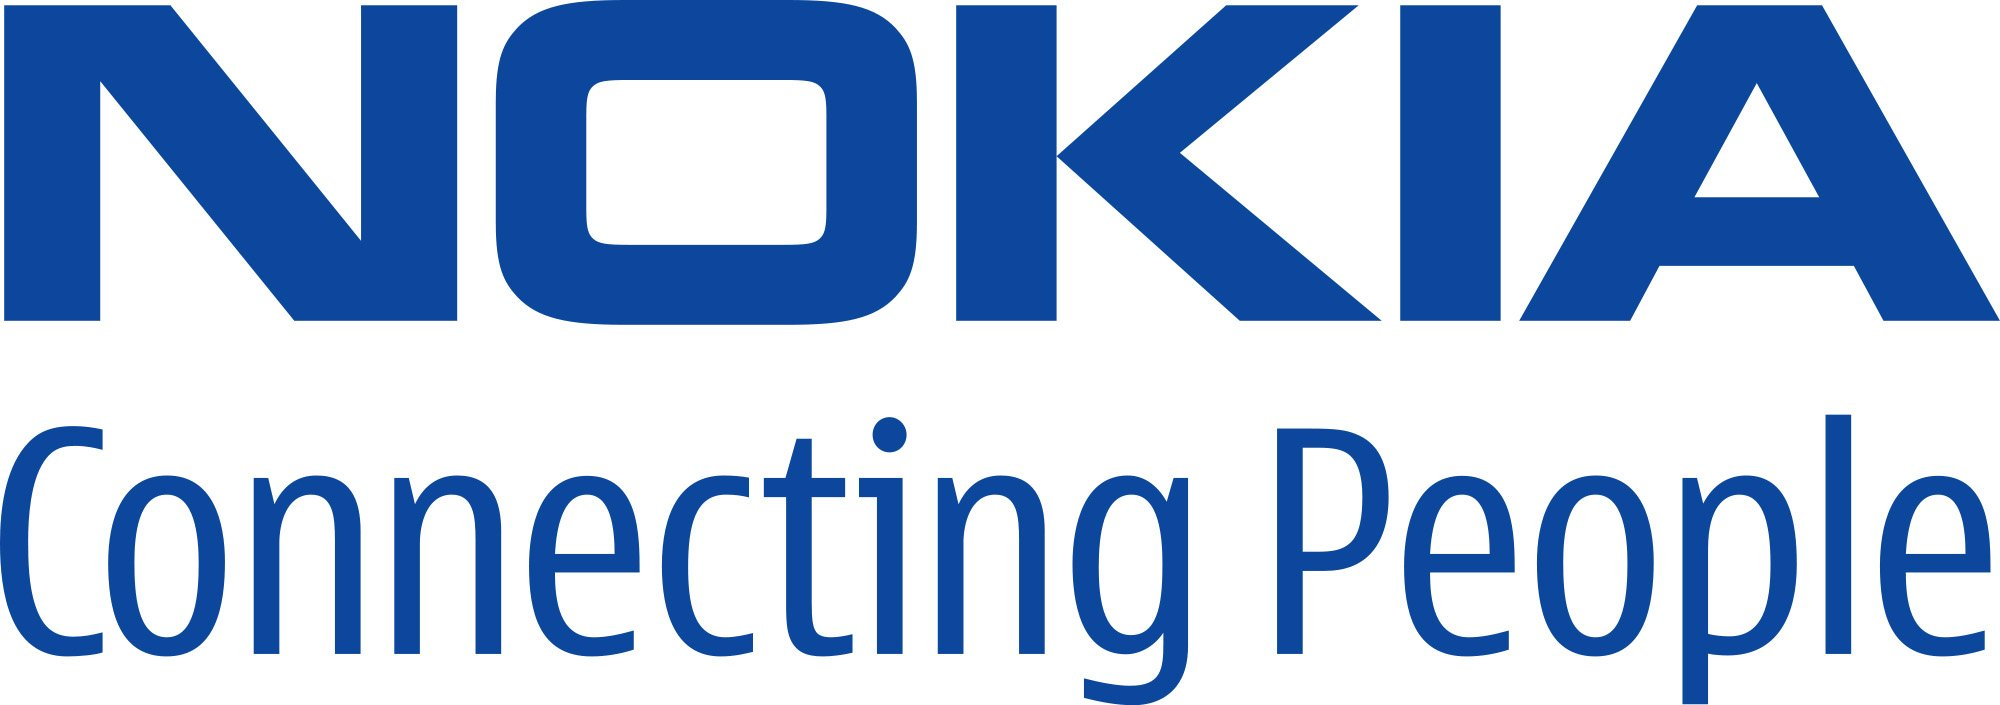 Nokia Logo Nokia Symbol Meaning History And Evolution